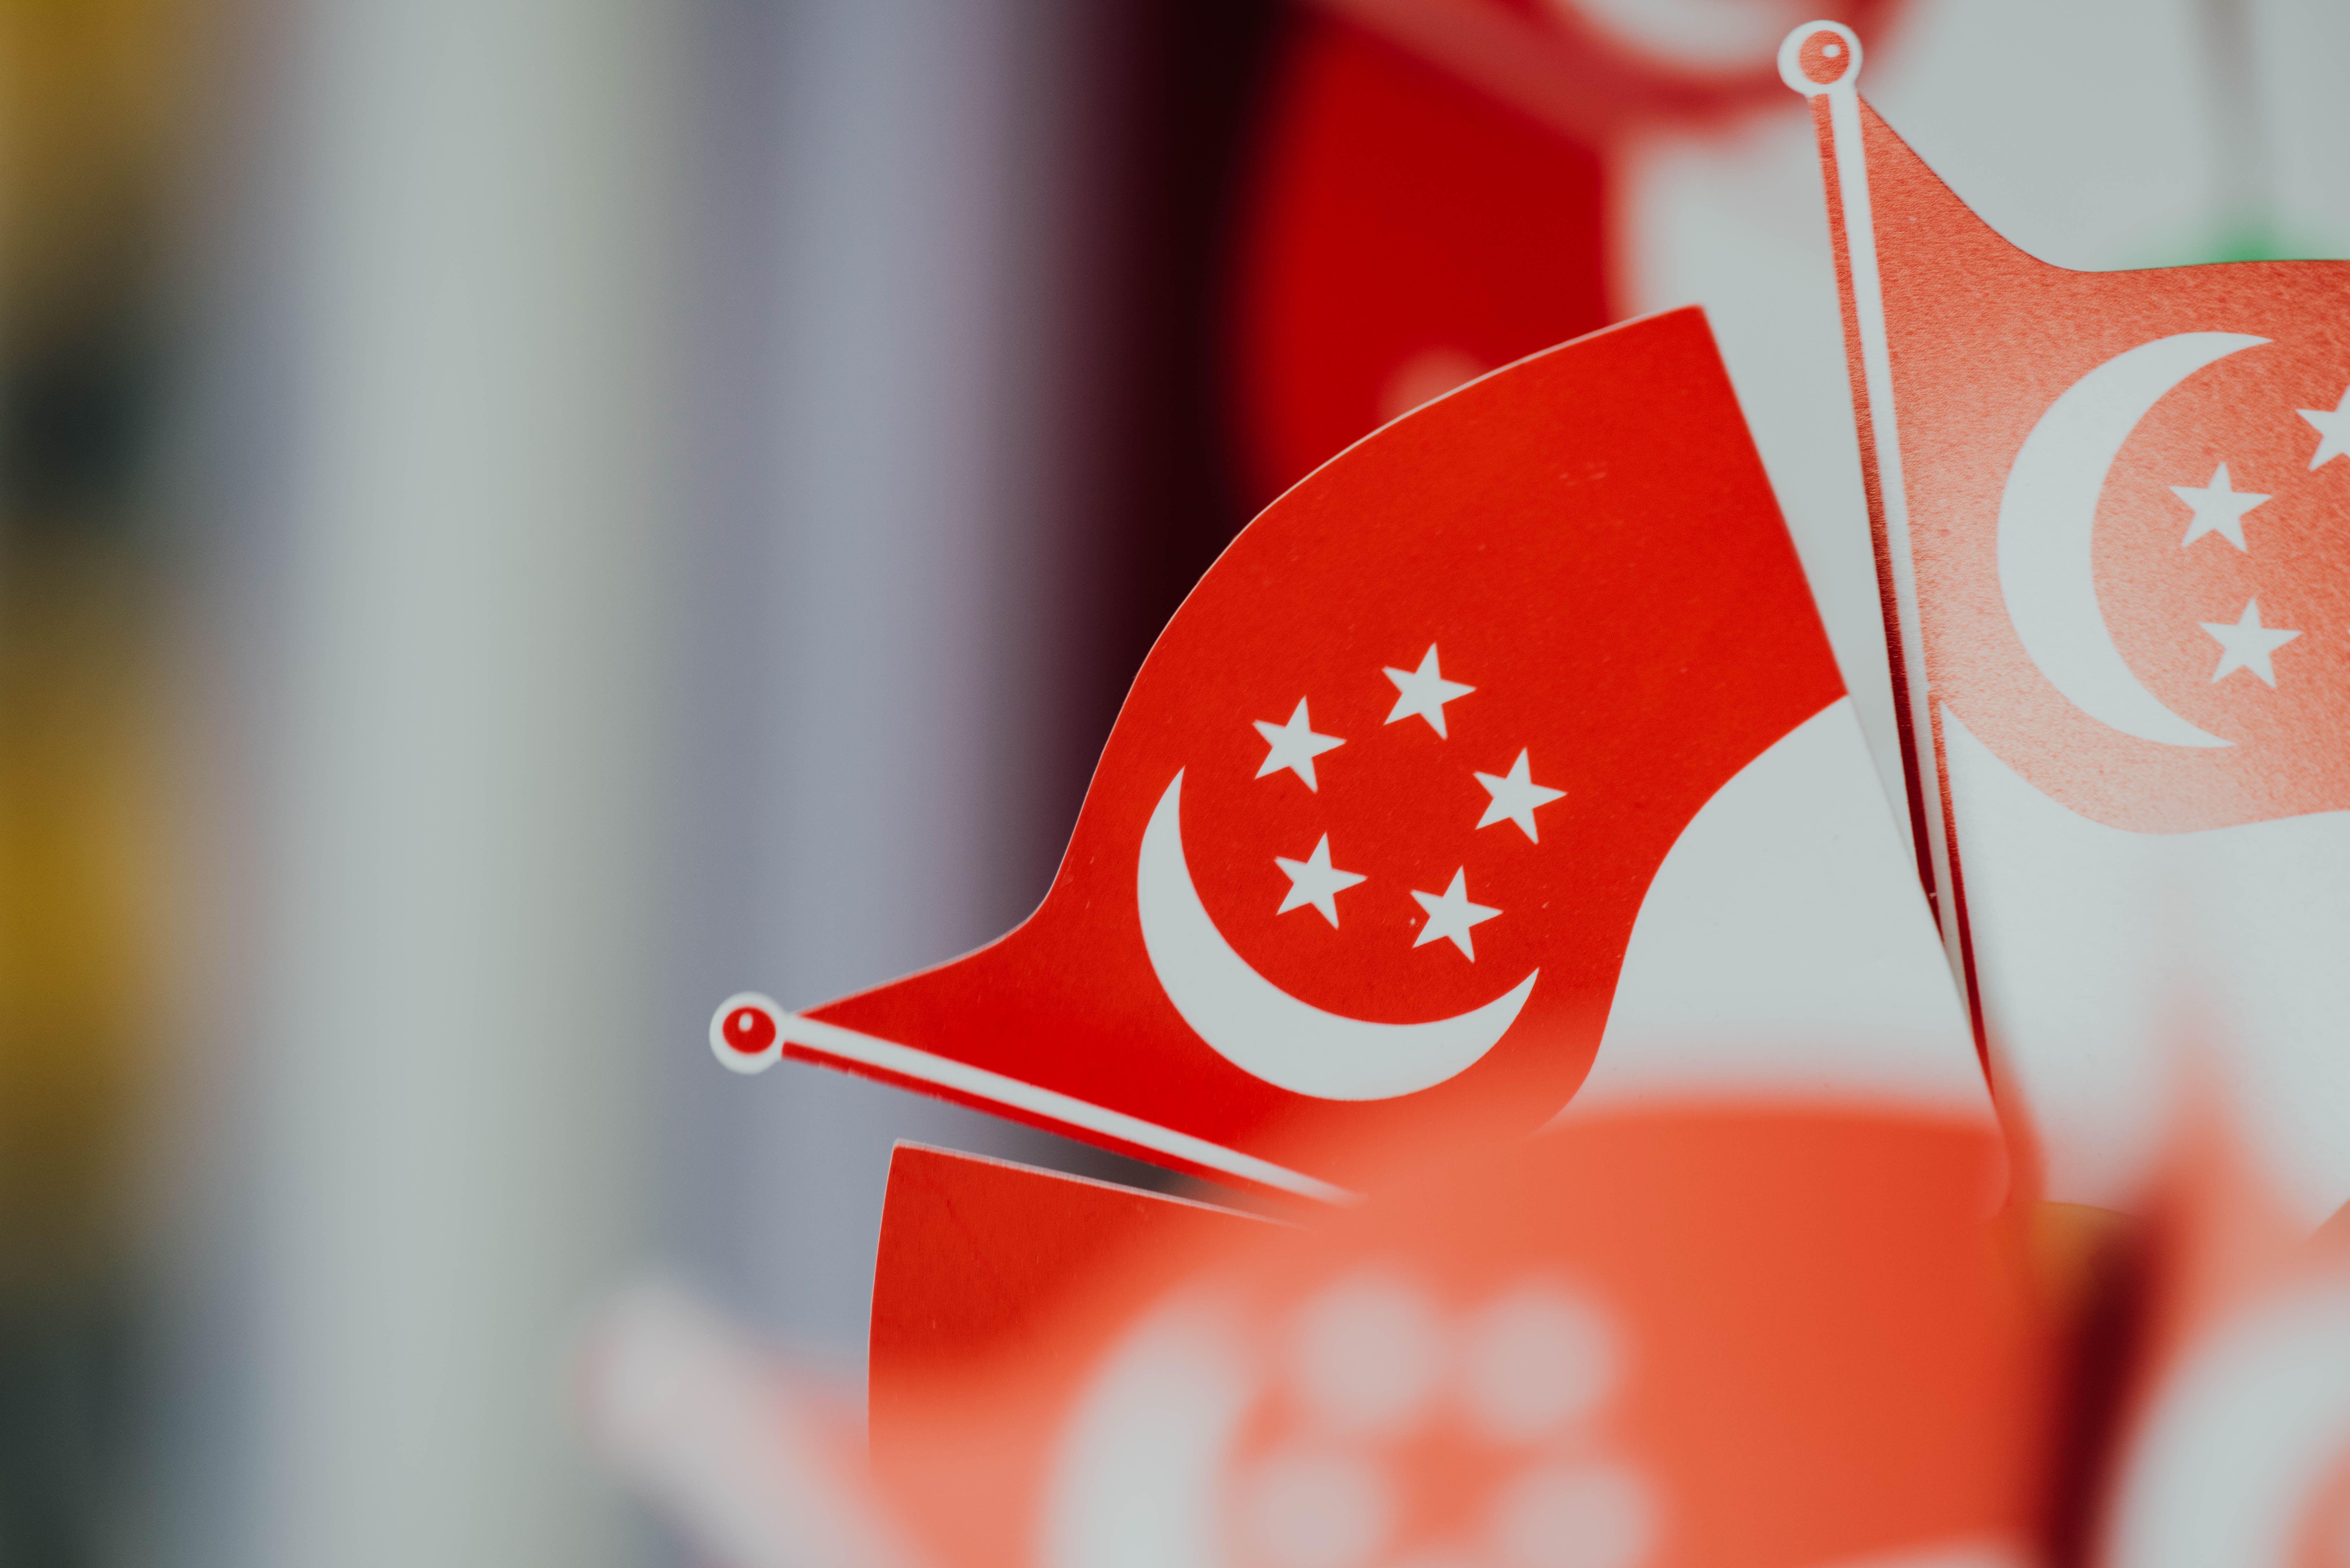 Postal Codes in Singapore | PropertyGuru Singapore